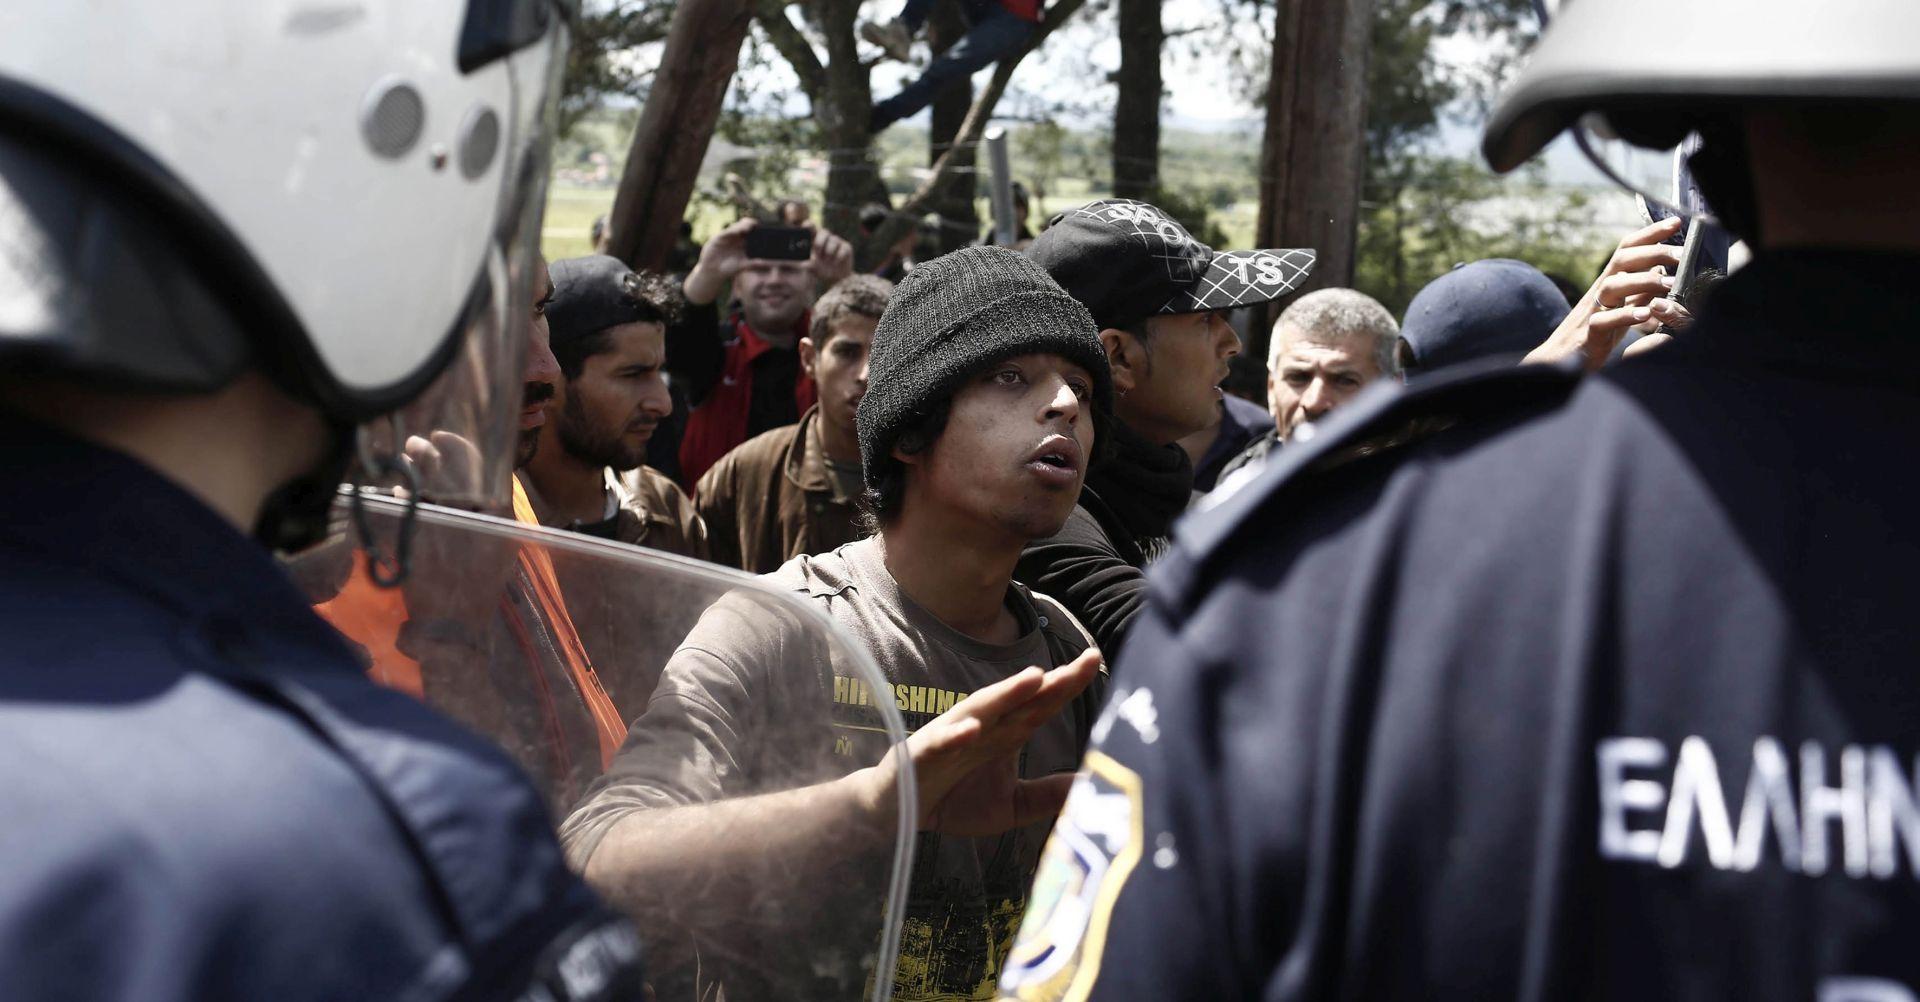 BUGARSKA Tisuću i pol izbjeglica sukobilo se s policijom